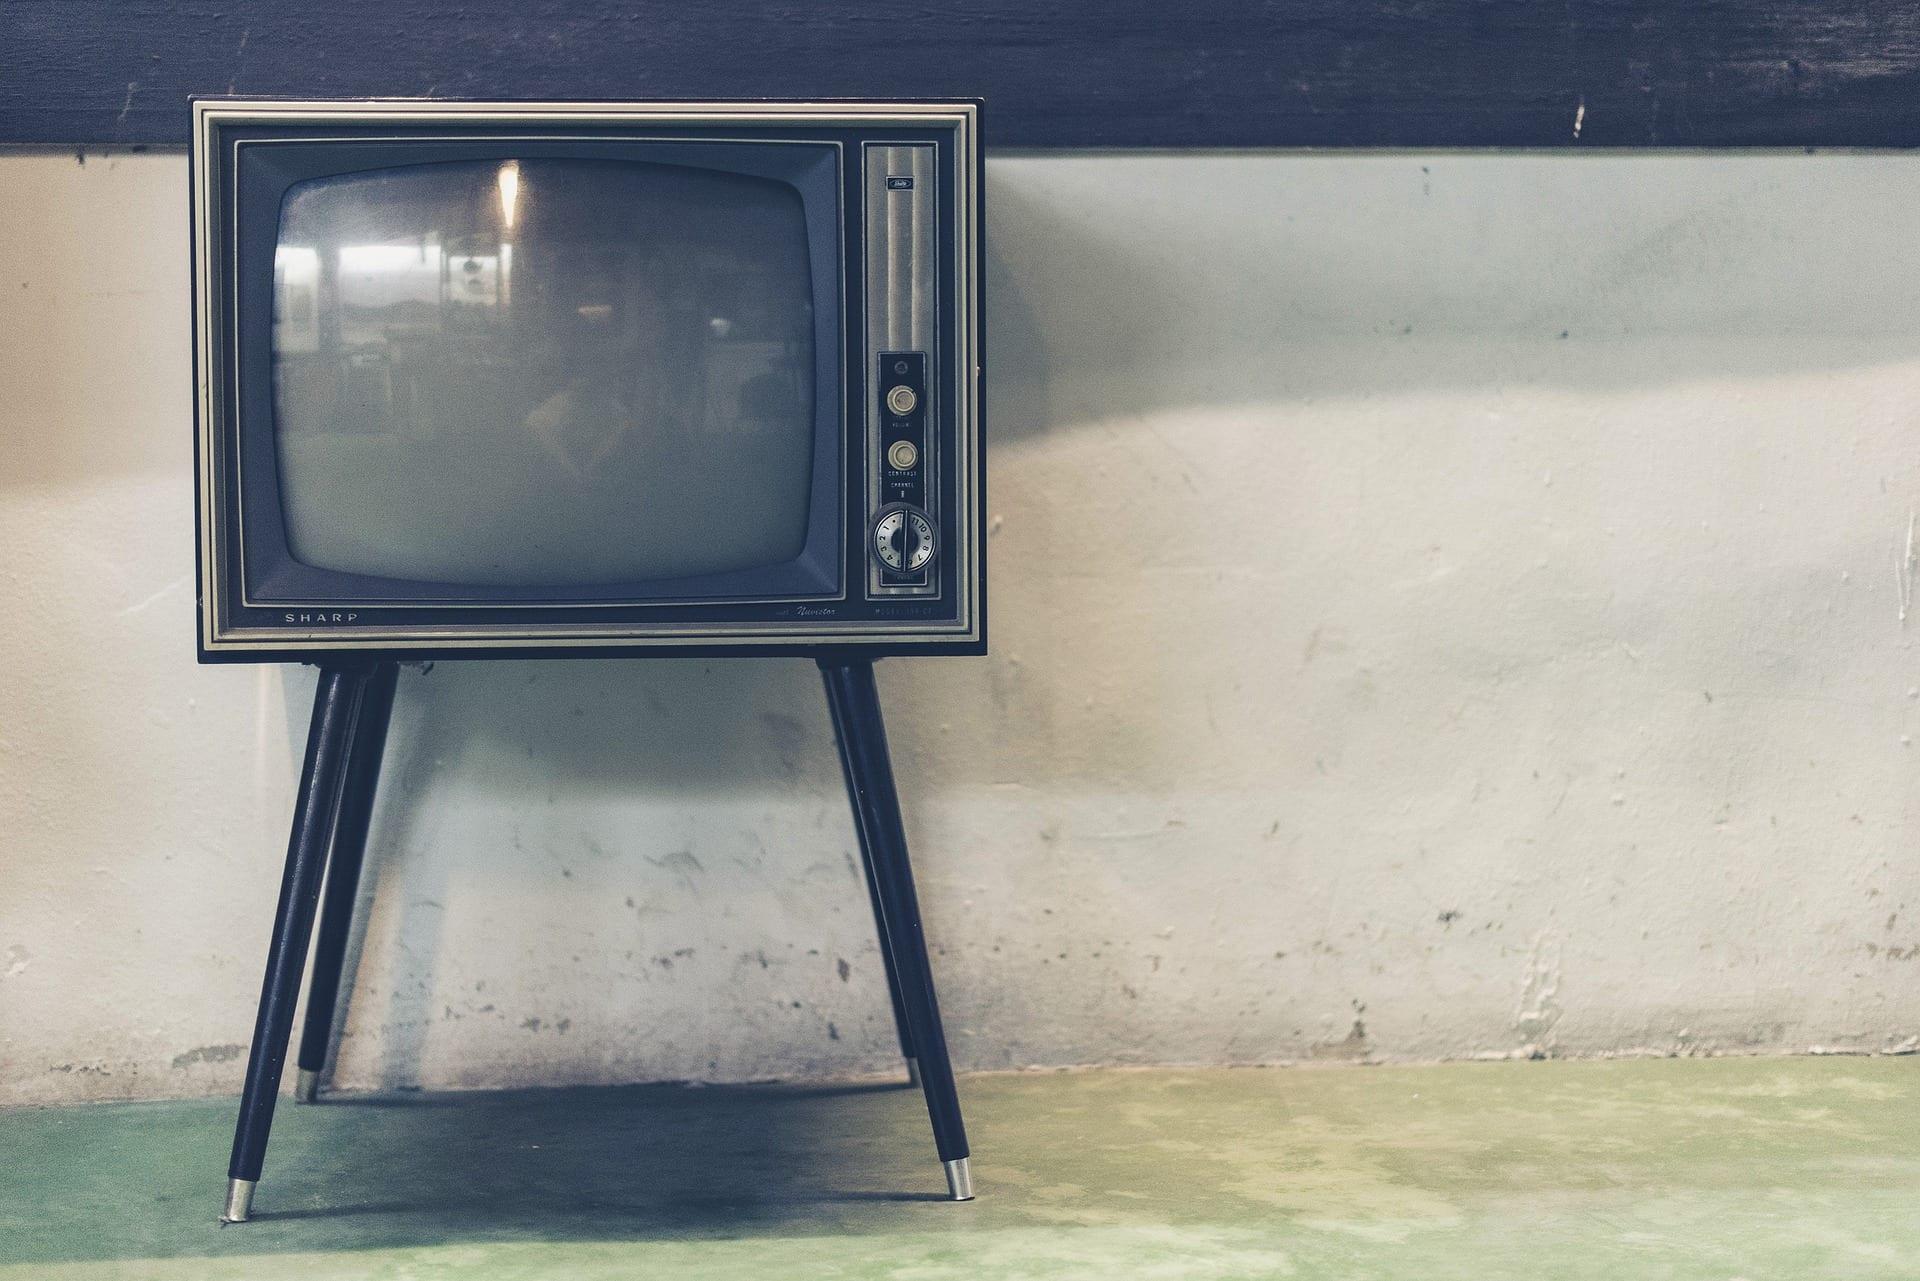 tv-reklame-enklere-valg